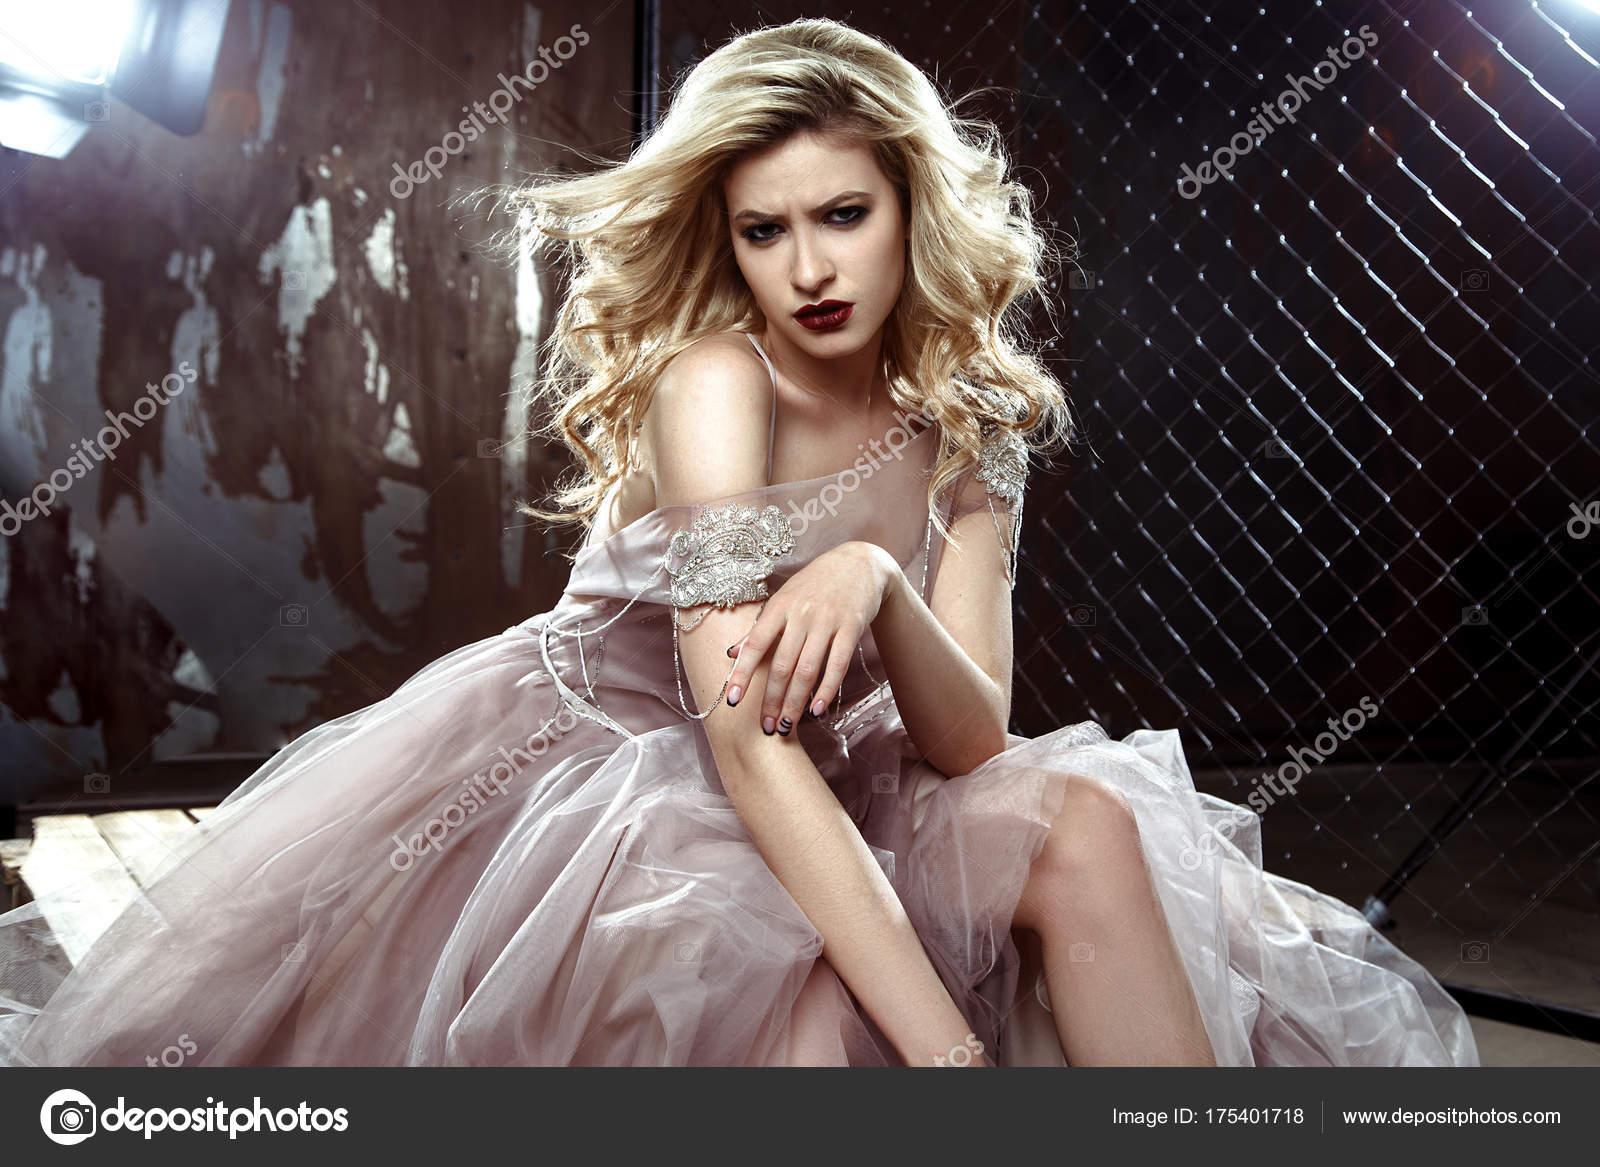 e7db64d33828 Πολύ Όμορφη Ξανθιά Νεαρή Νύφη Γυναίκα Στο Χρώμα Νυφικό Ροκ — Φωτογραφία  Αρχείου